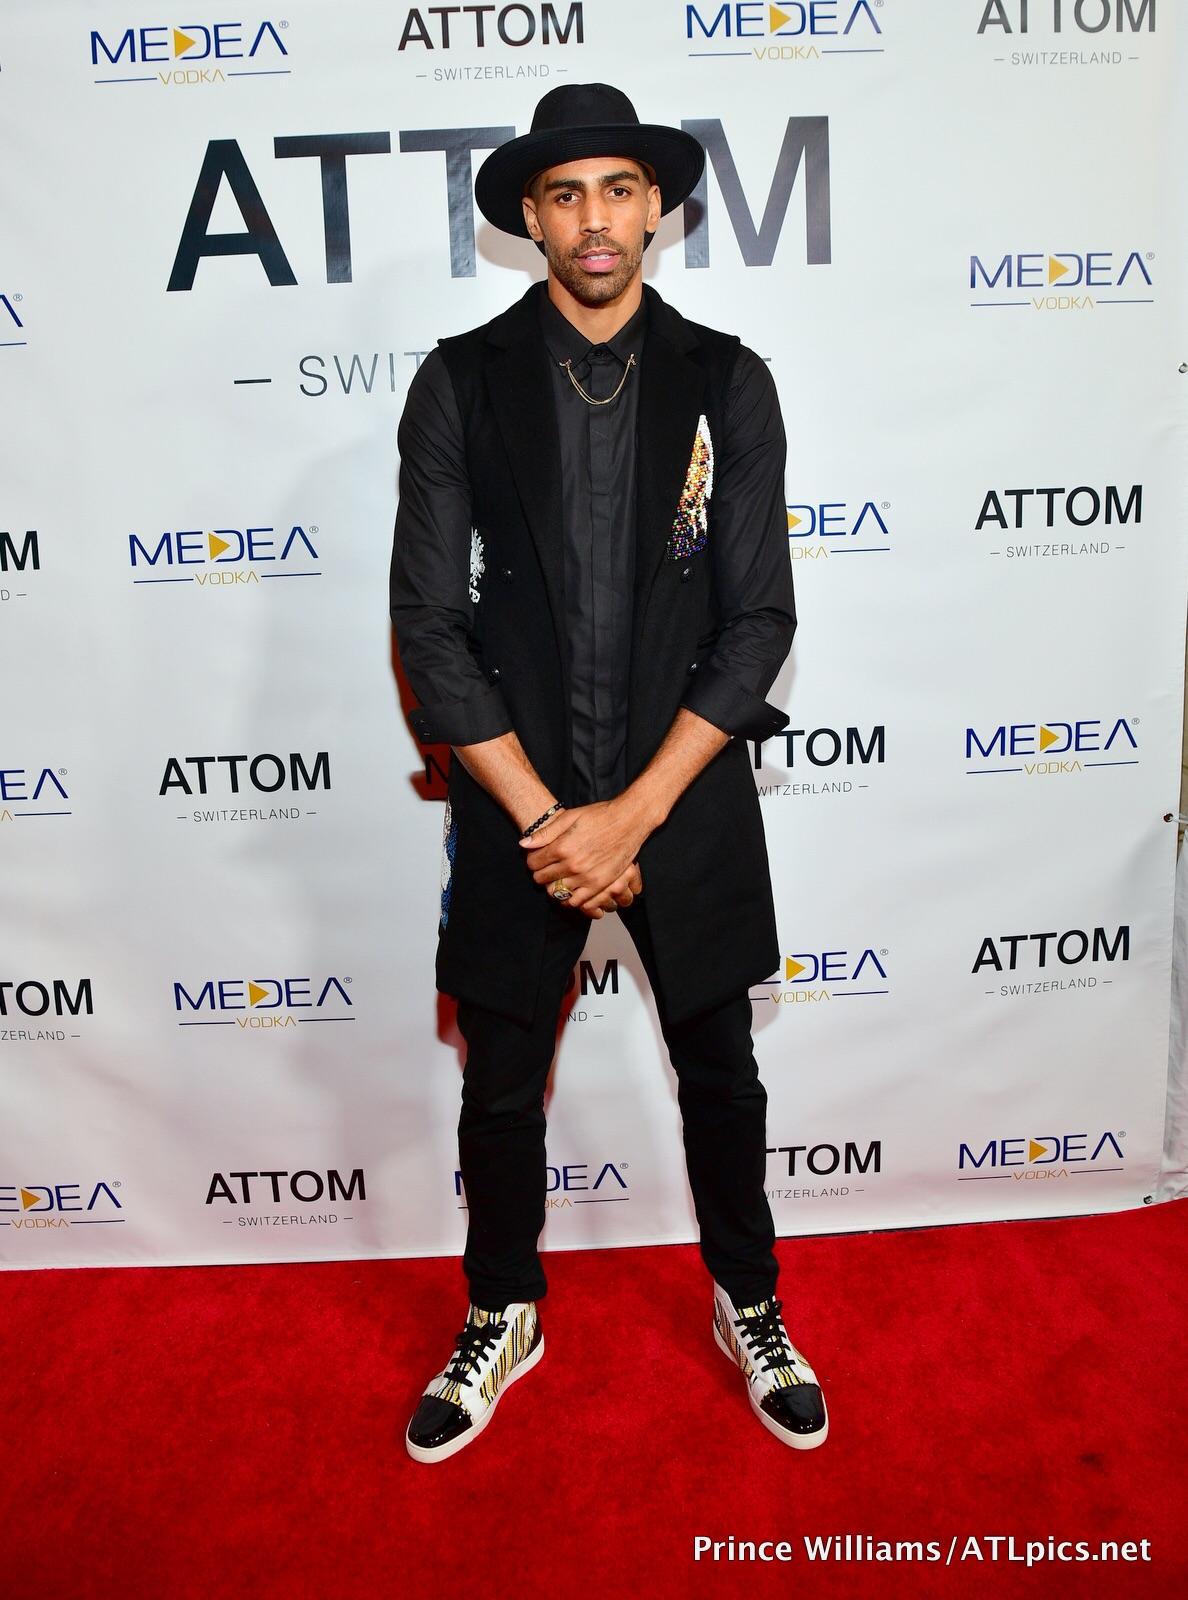 STYLE: NBA Thabo Sefolosha Talks ATTOM ATL Luxury Men's Store Opening, Fashion Trends And More